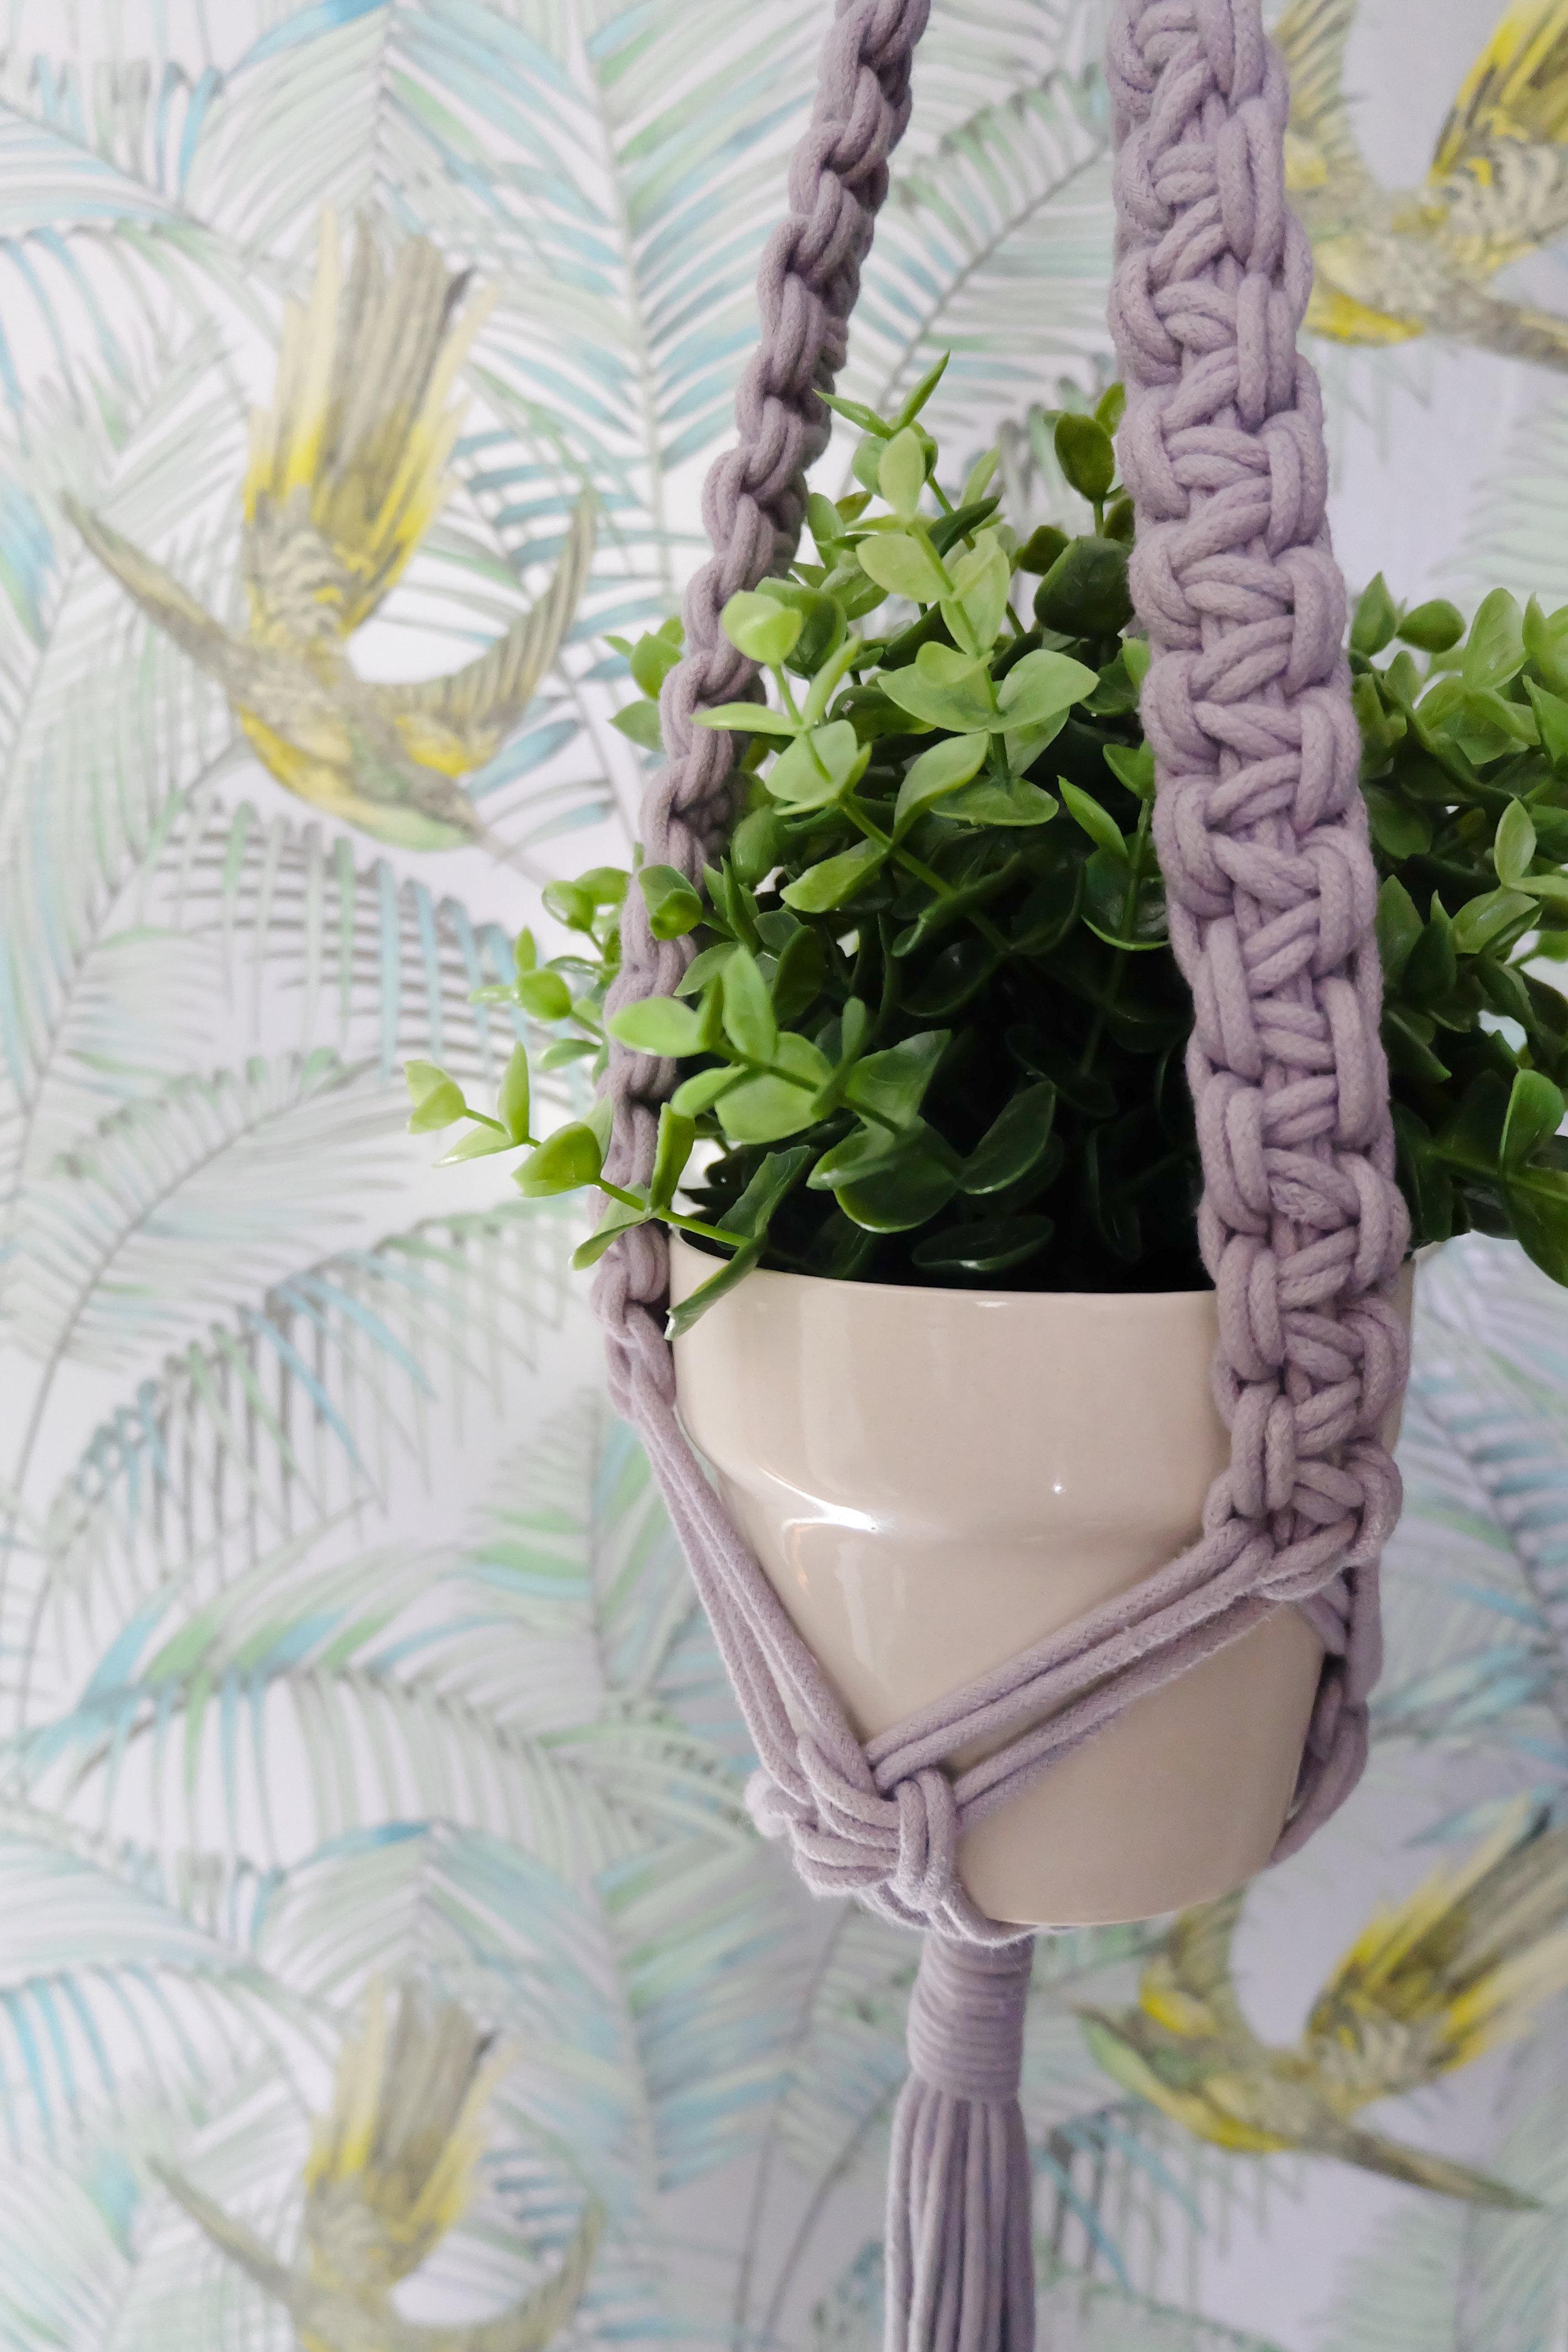 Macamre plant holder